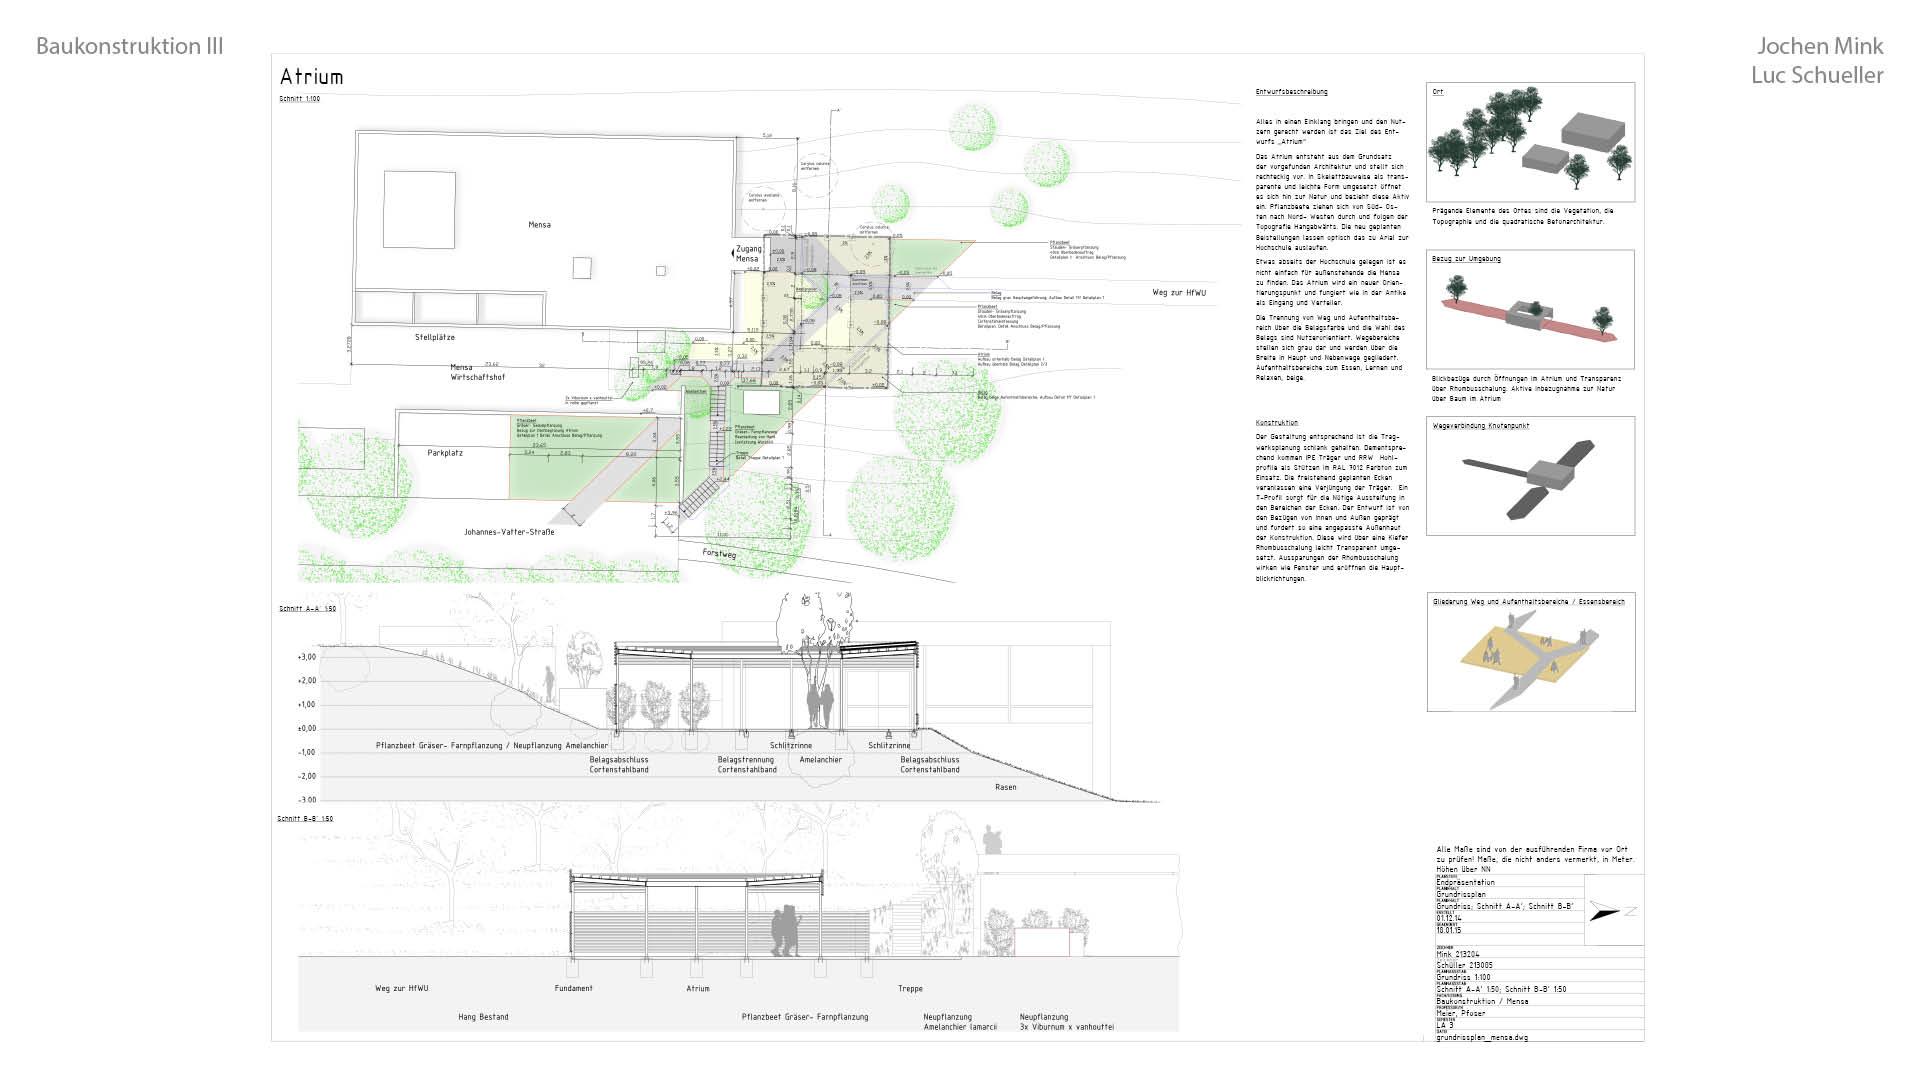 11 14 03 Baukonstruktion III